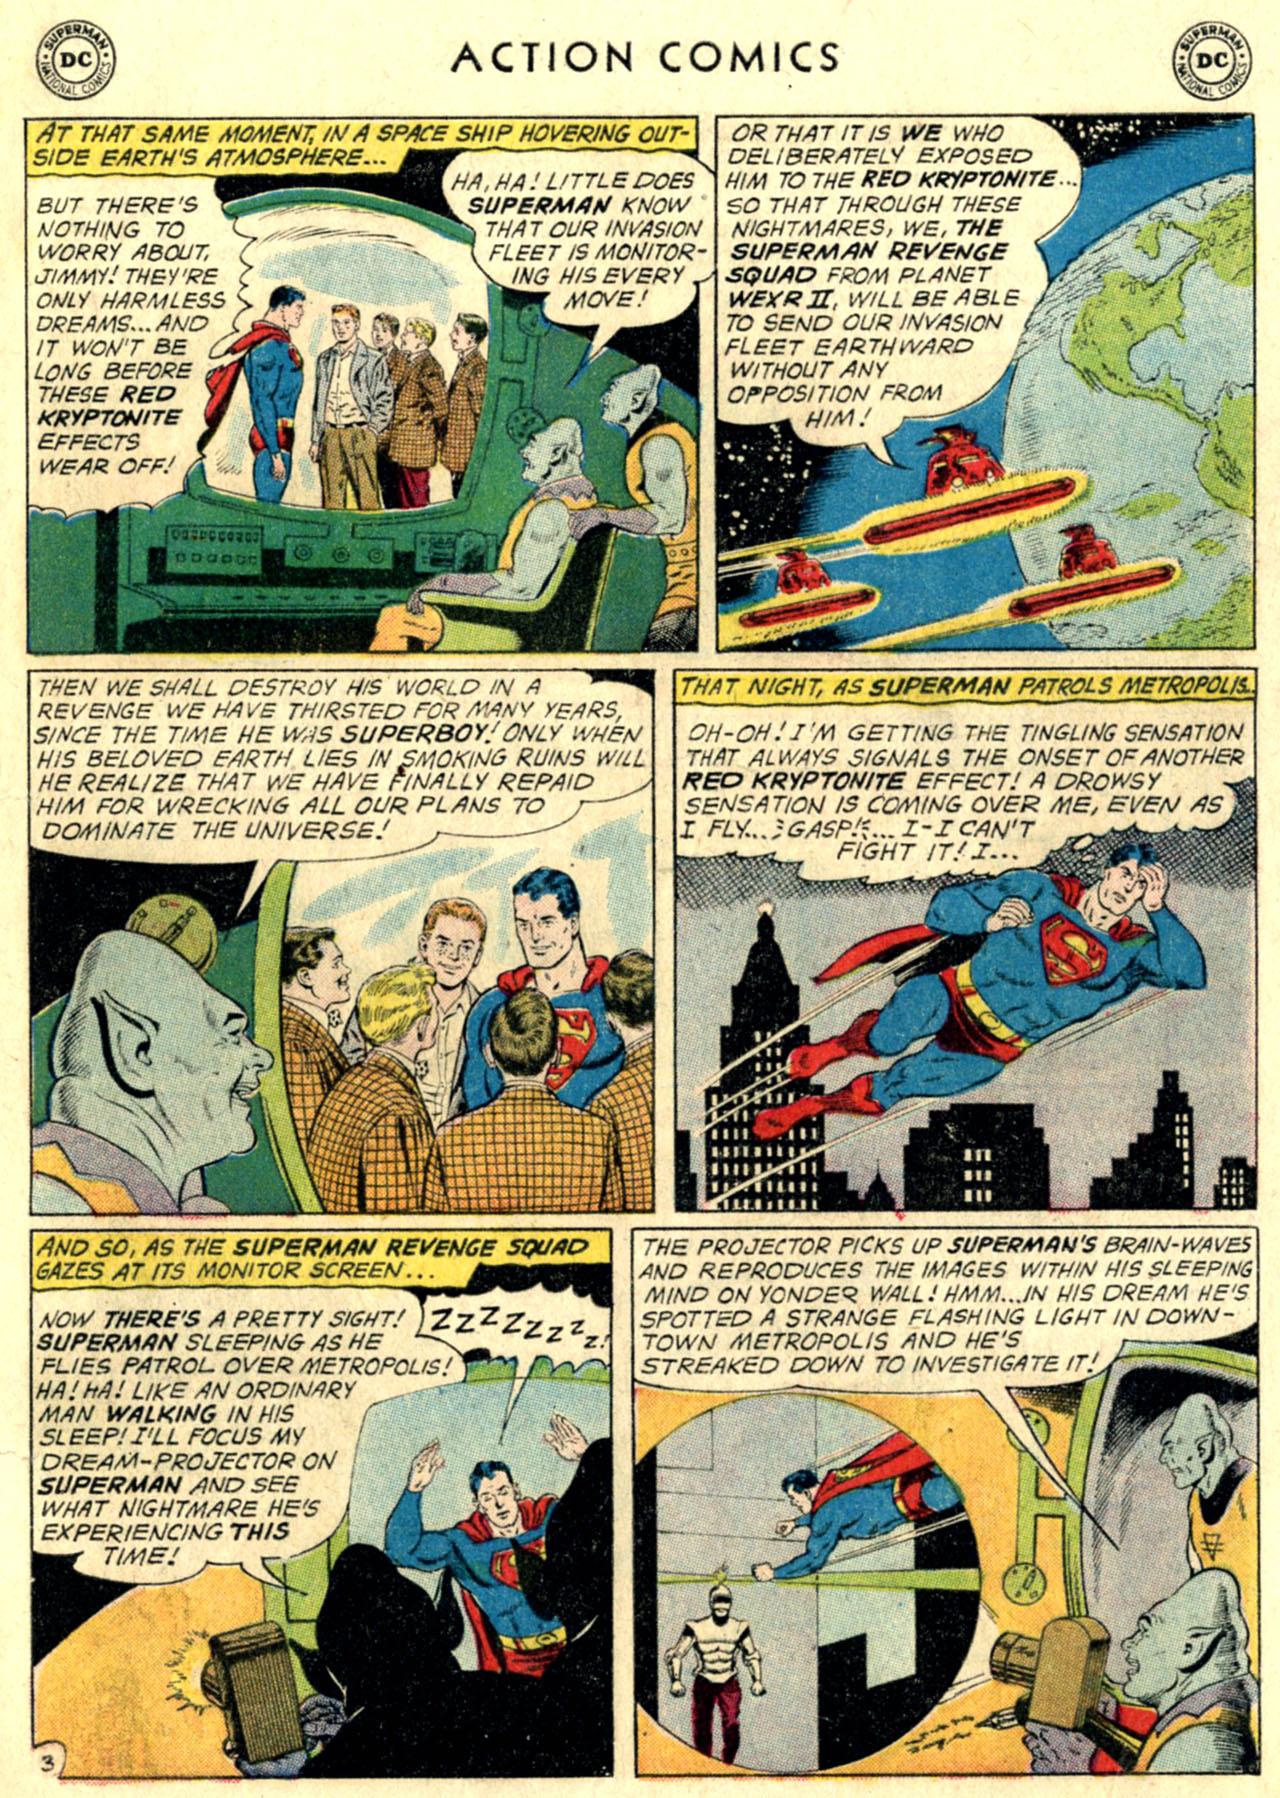 Action Comics (1938) 287 Page 4